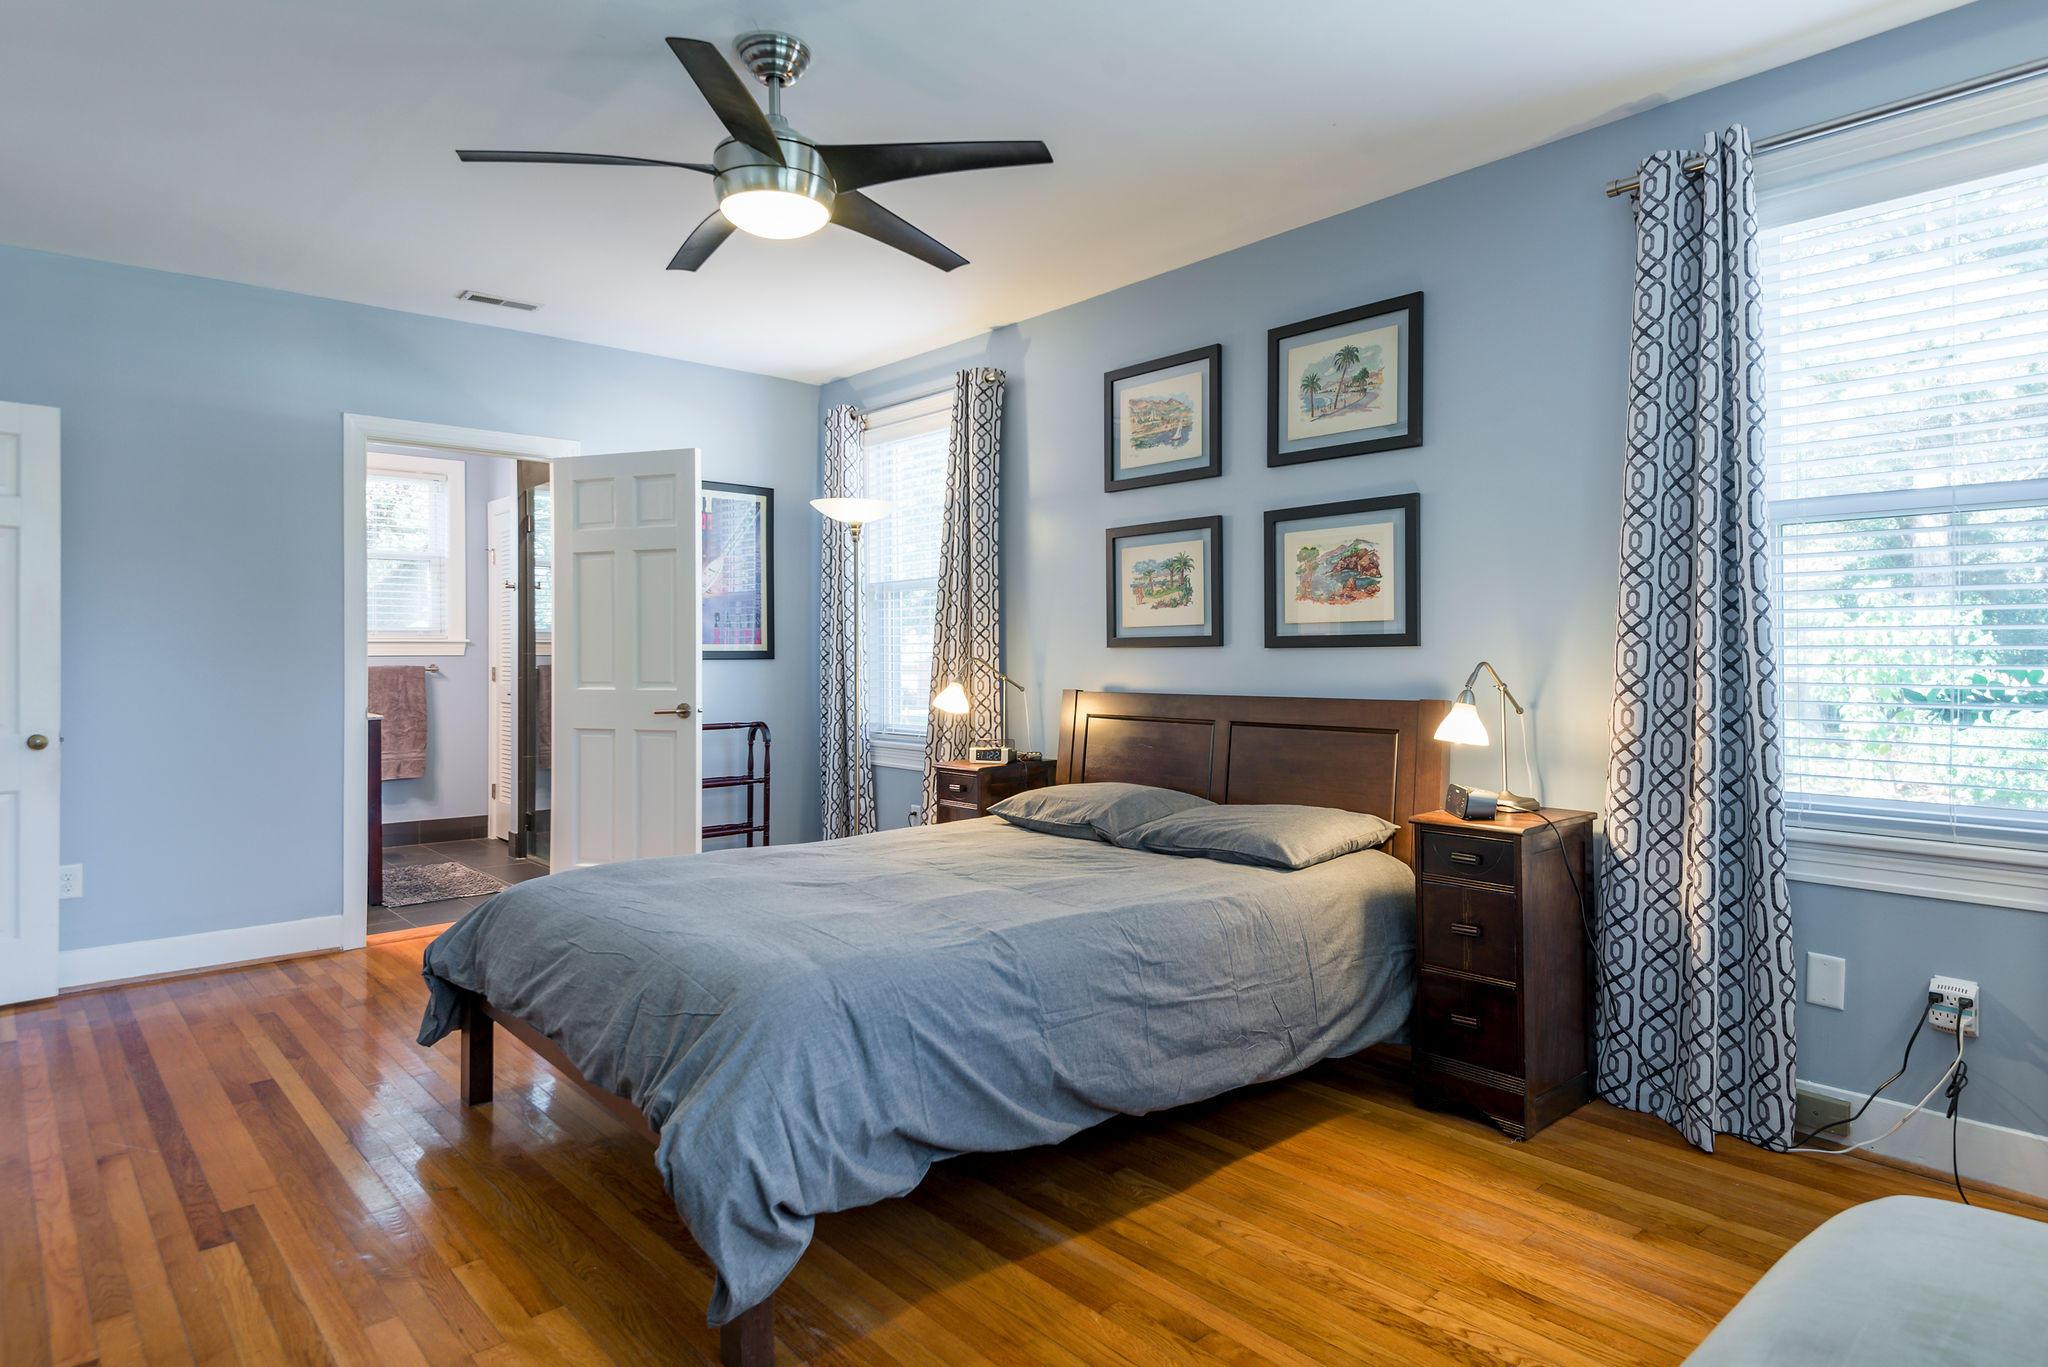 Sylvan Shores Homes For Sale - 450 Polony, Charleston, SC - 30